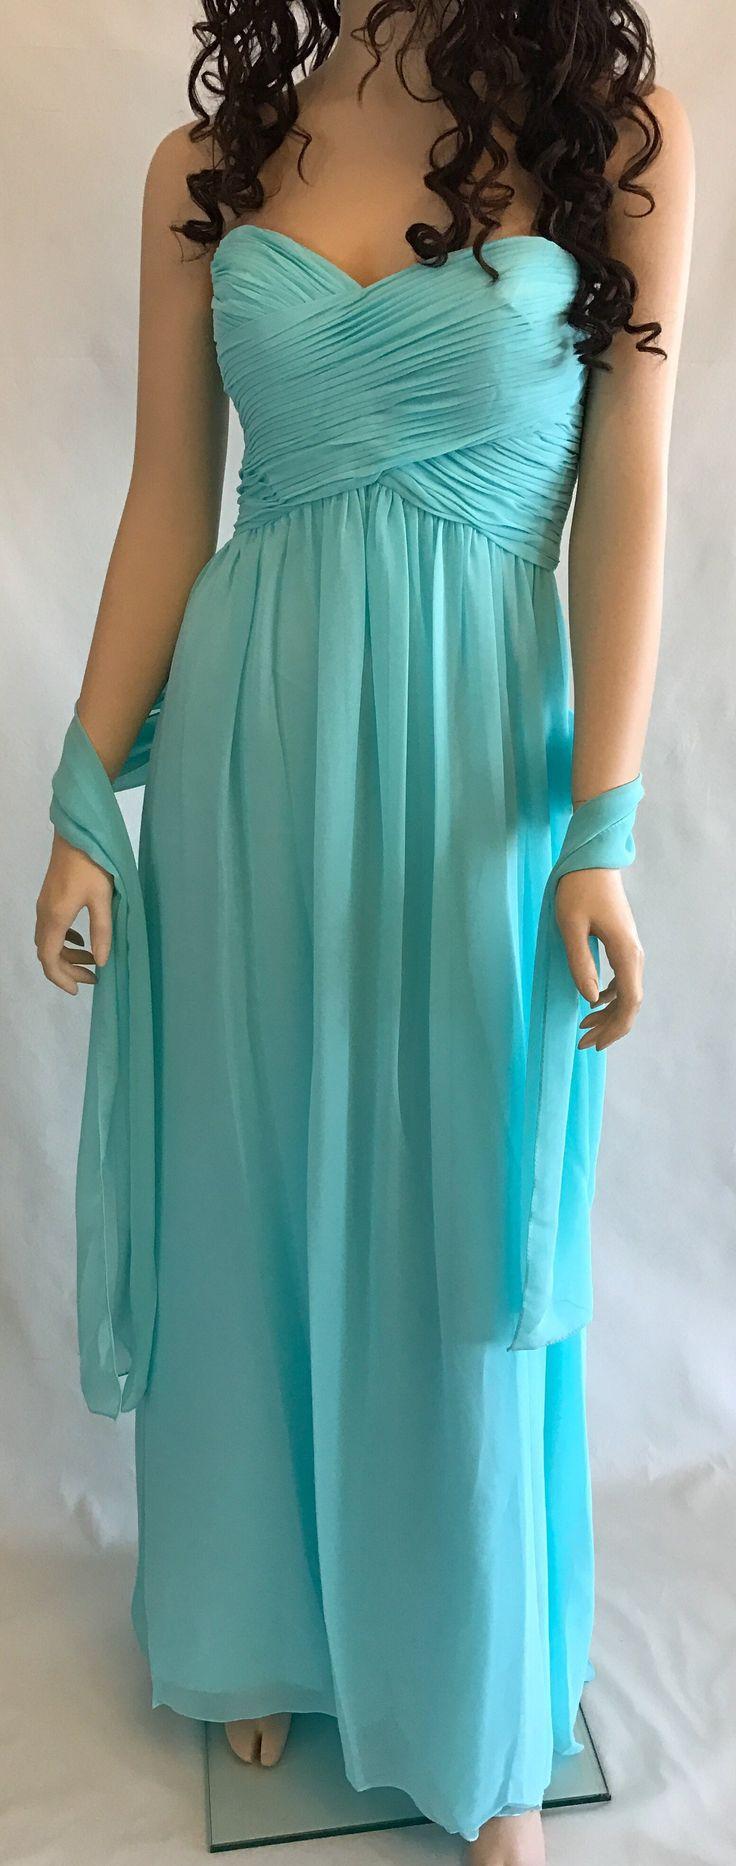 FIRST COMES LOVE CHIFFON STRAPLESS MAXI DRESS - AQUA BLUE